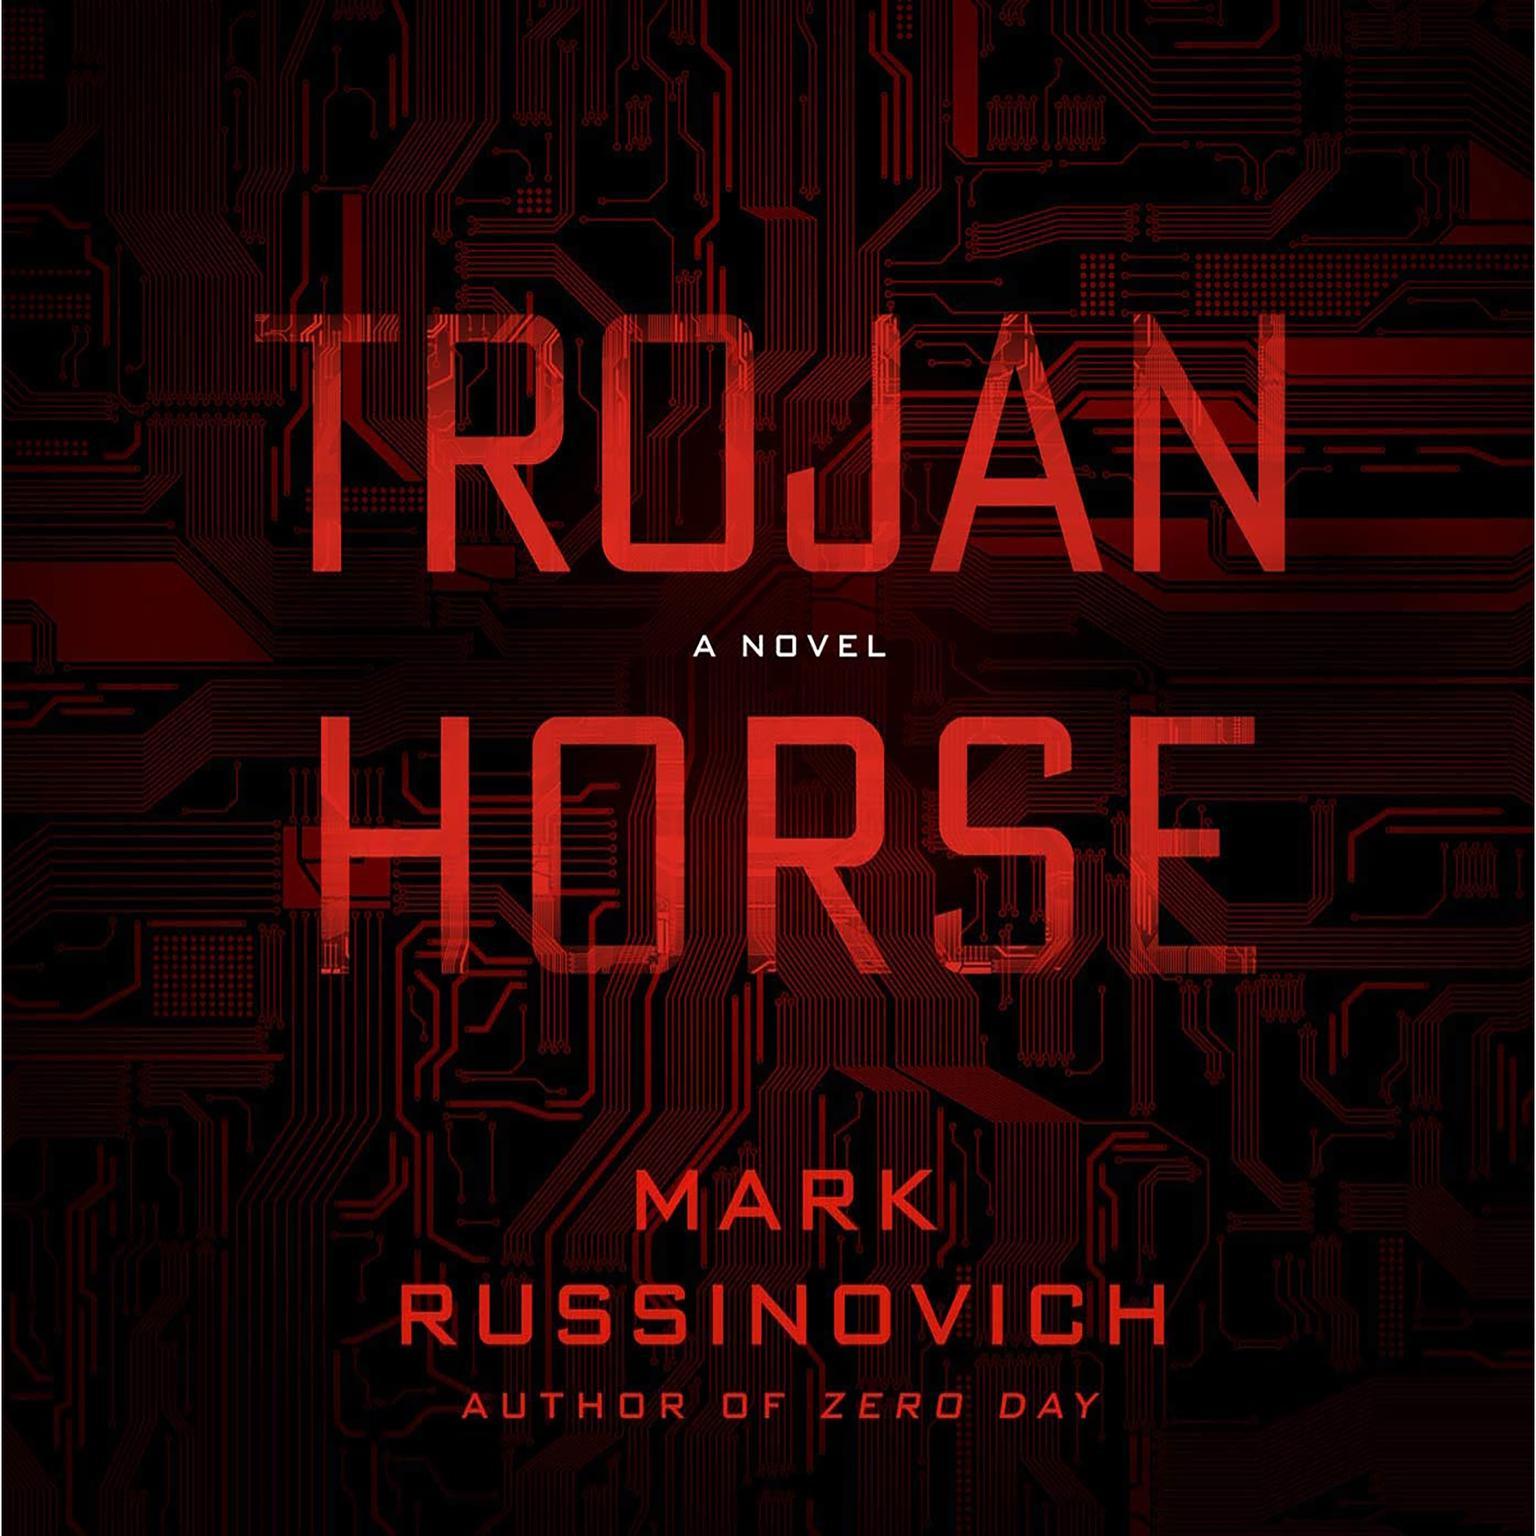 Printable Trojan Horse: A Jeff Aiken Novel Audiobook Cover Art